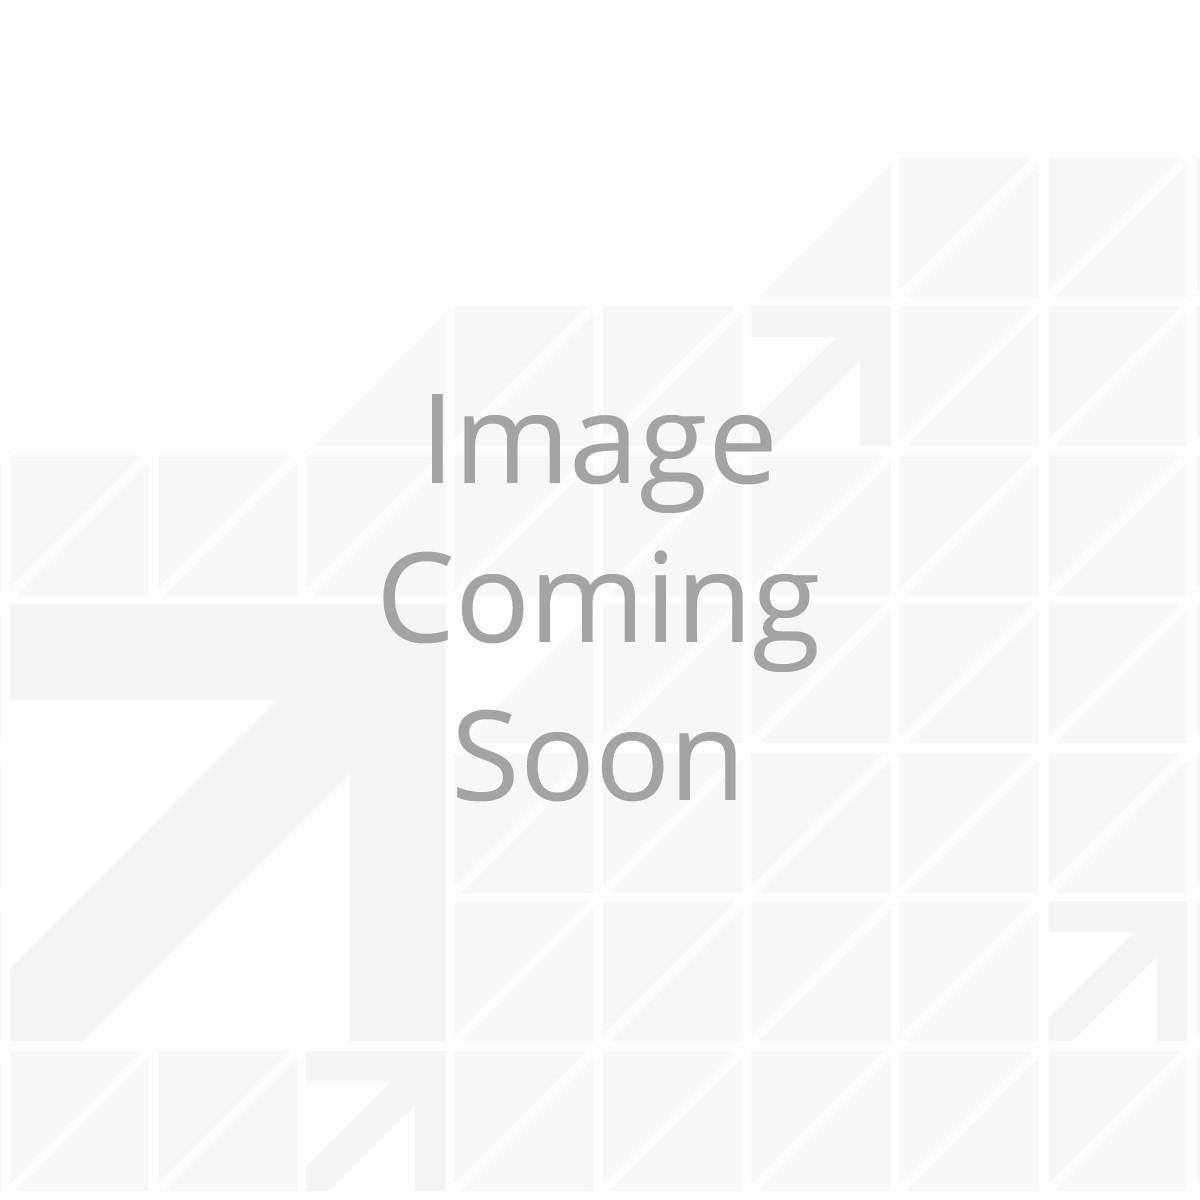 Hydraulic Jack Assembly in Black - Aluminum - 8,000 lbs. (Gen I)